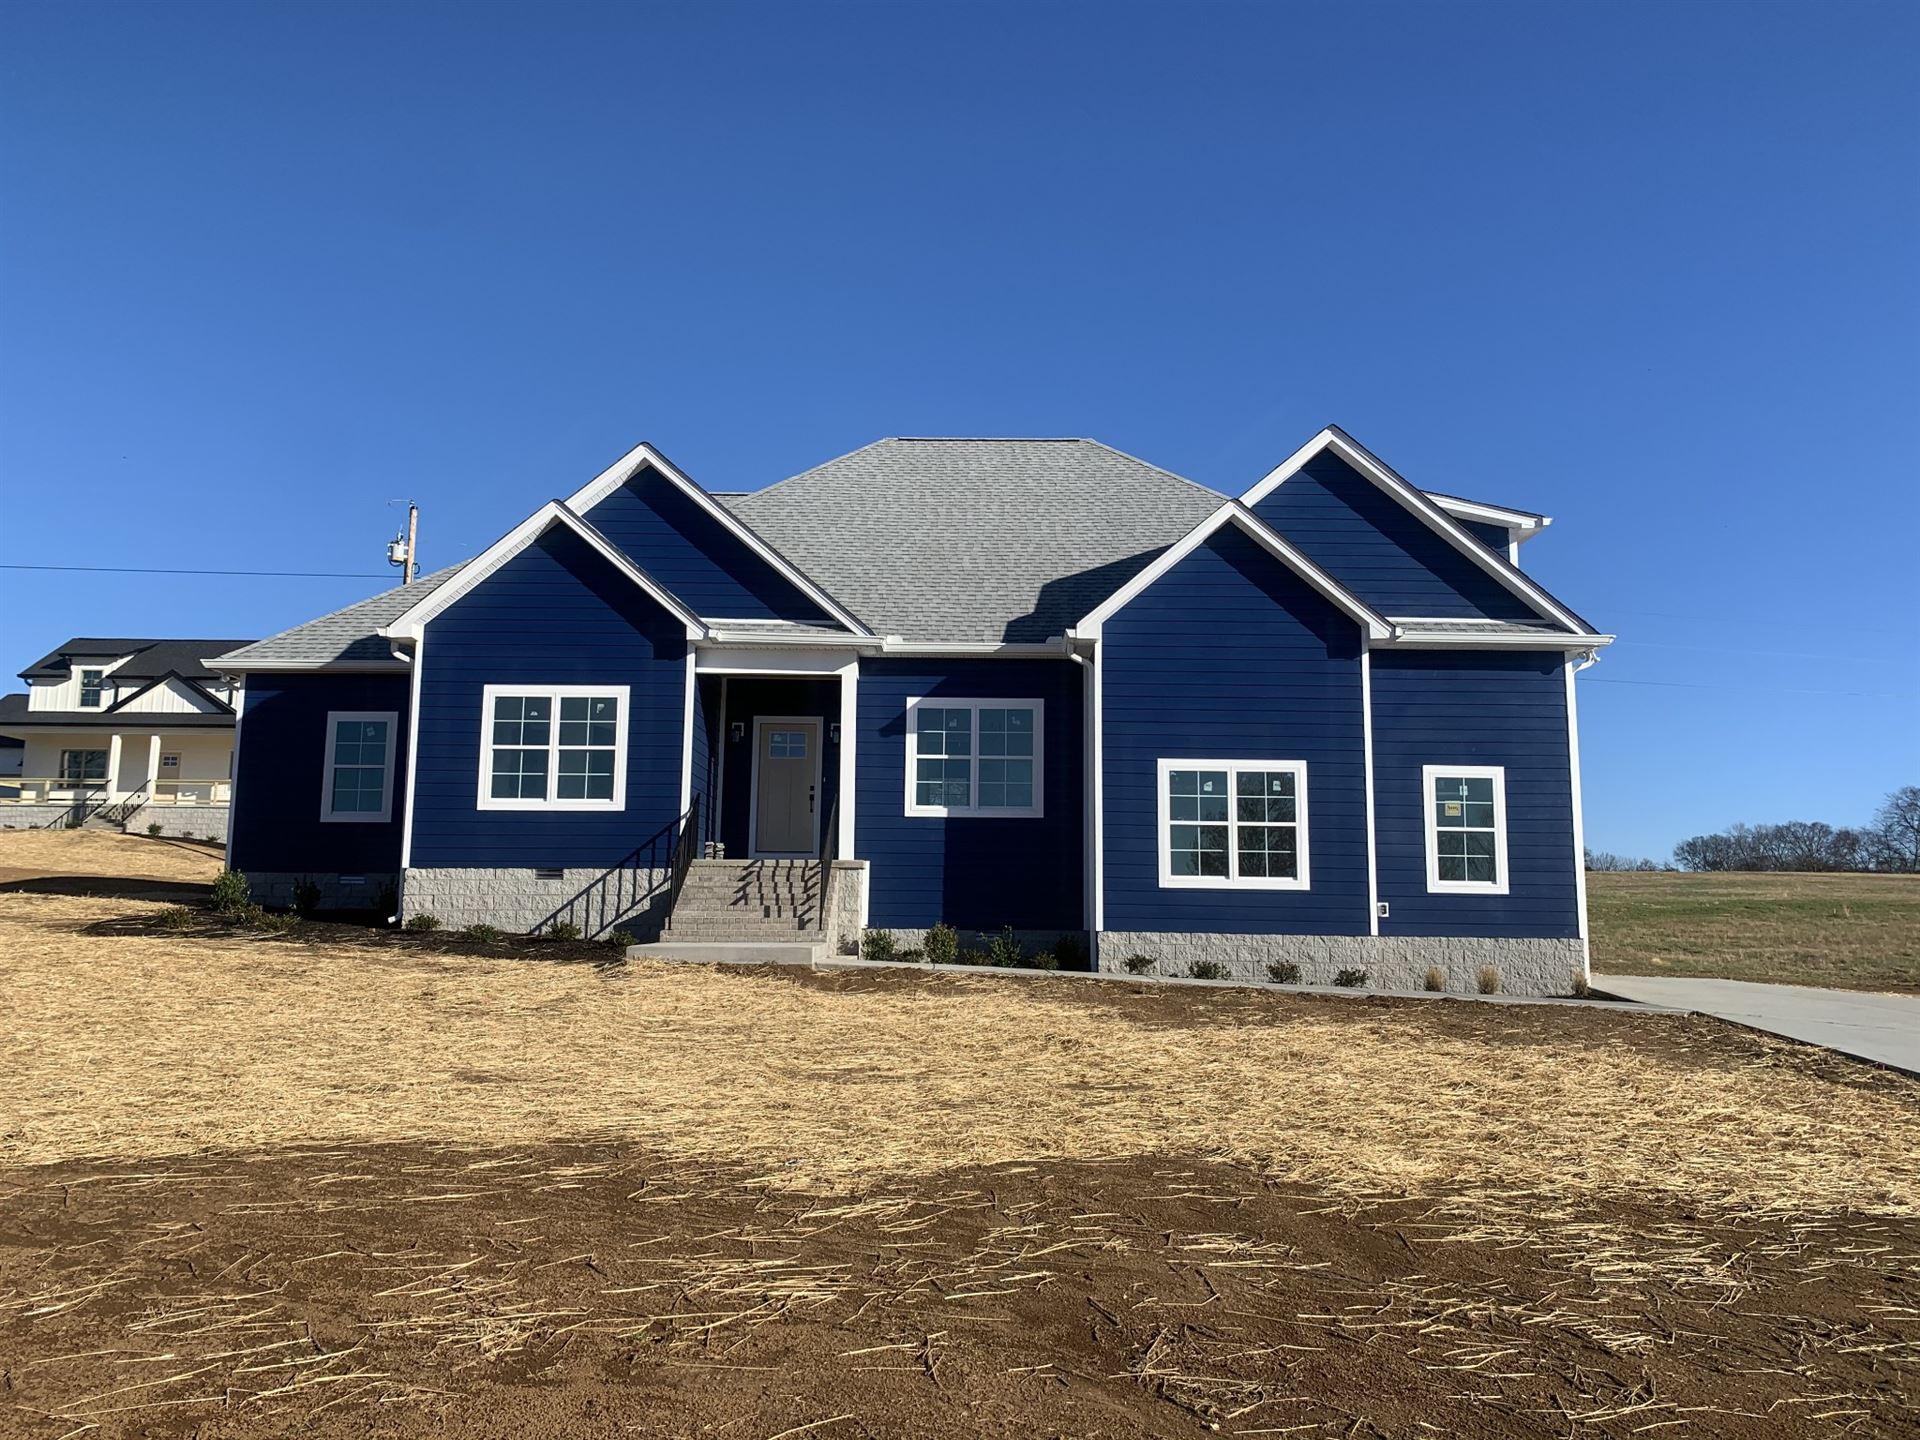 1384 Littleton Ranch Rd, Castalian Springs, TN 37031 - MLS#: 2302560